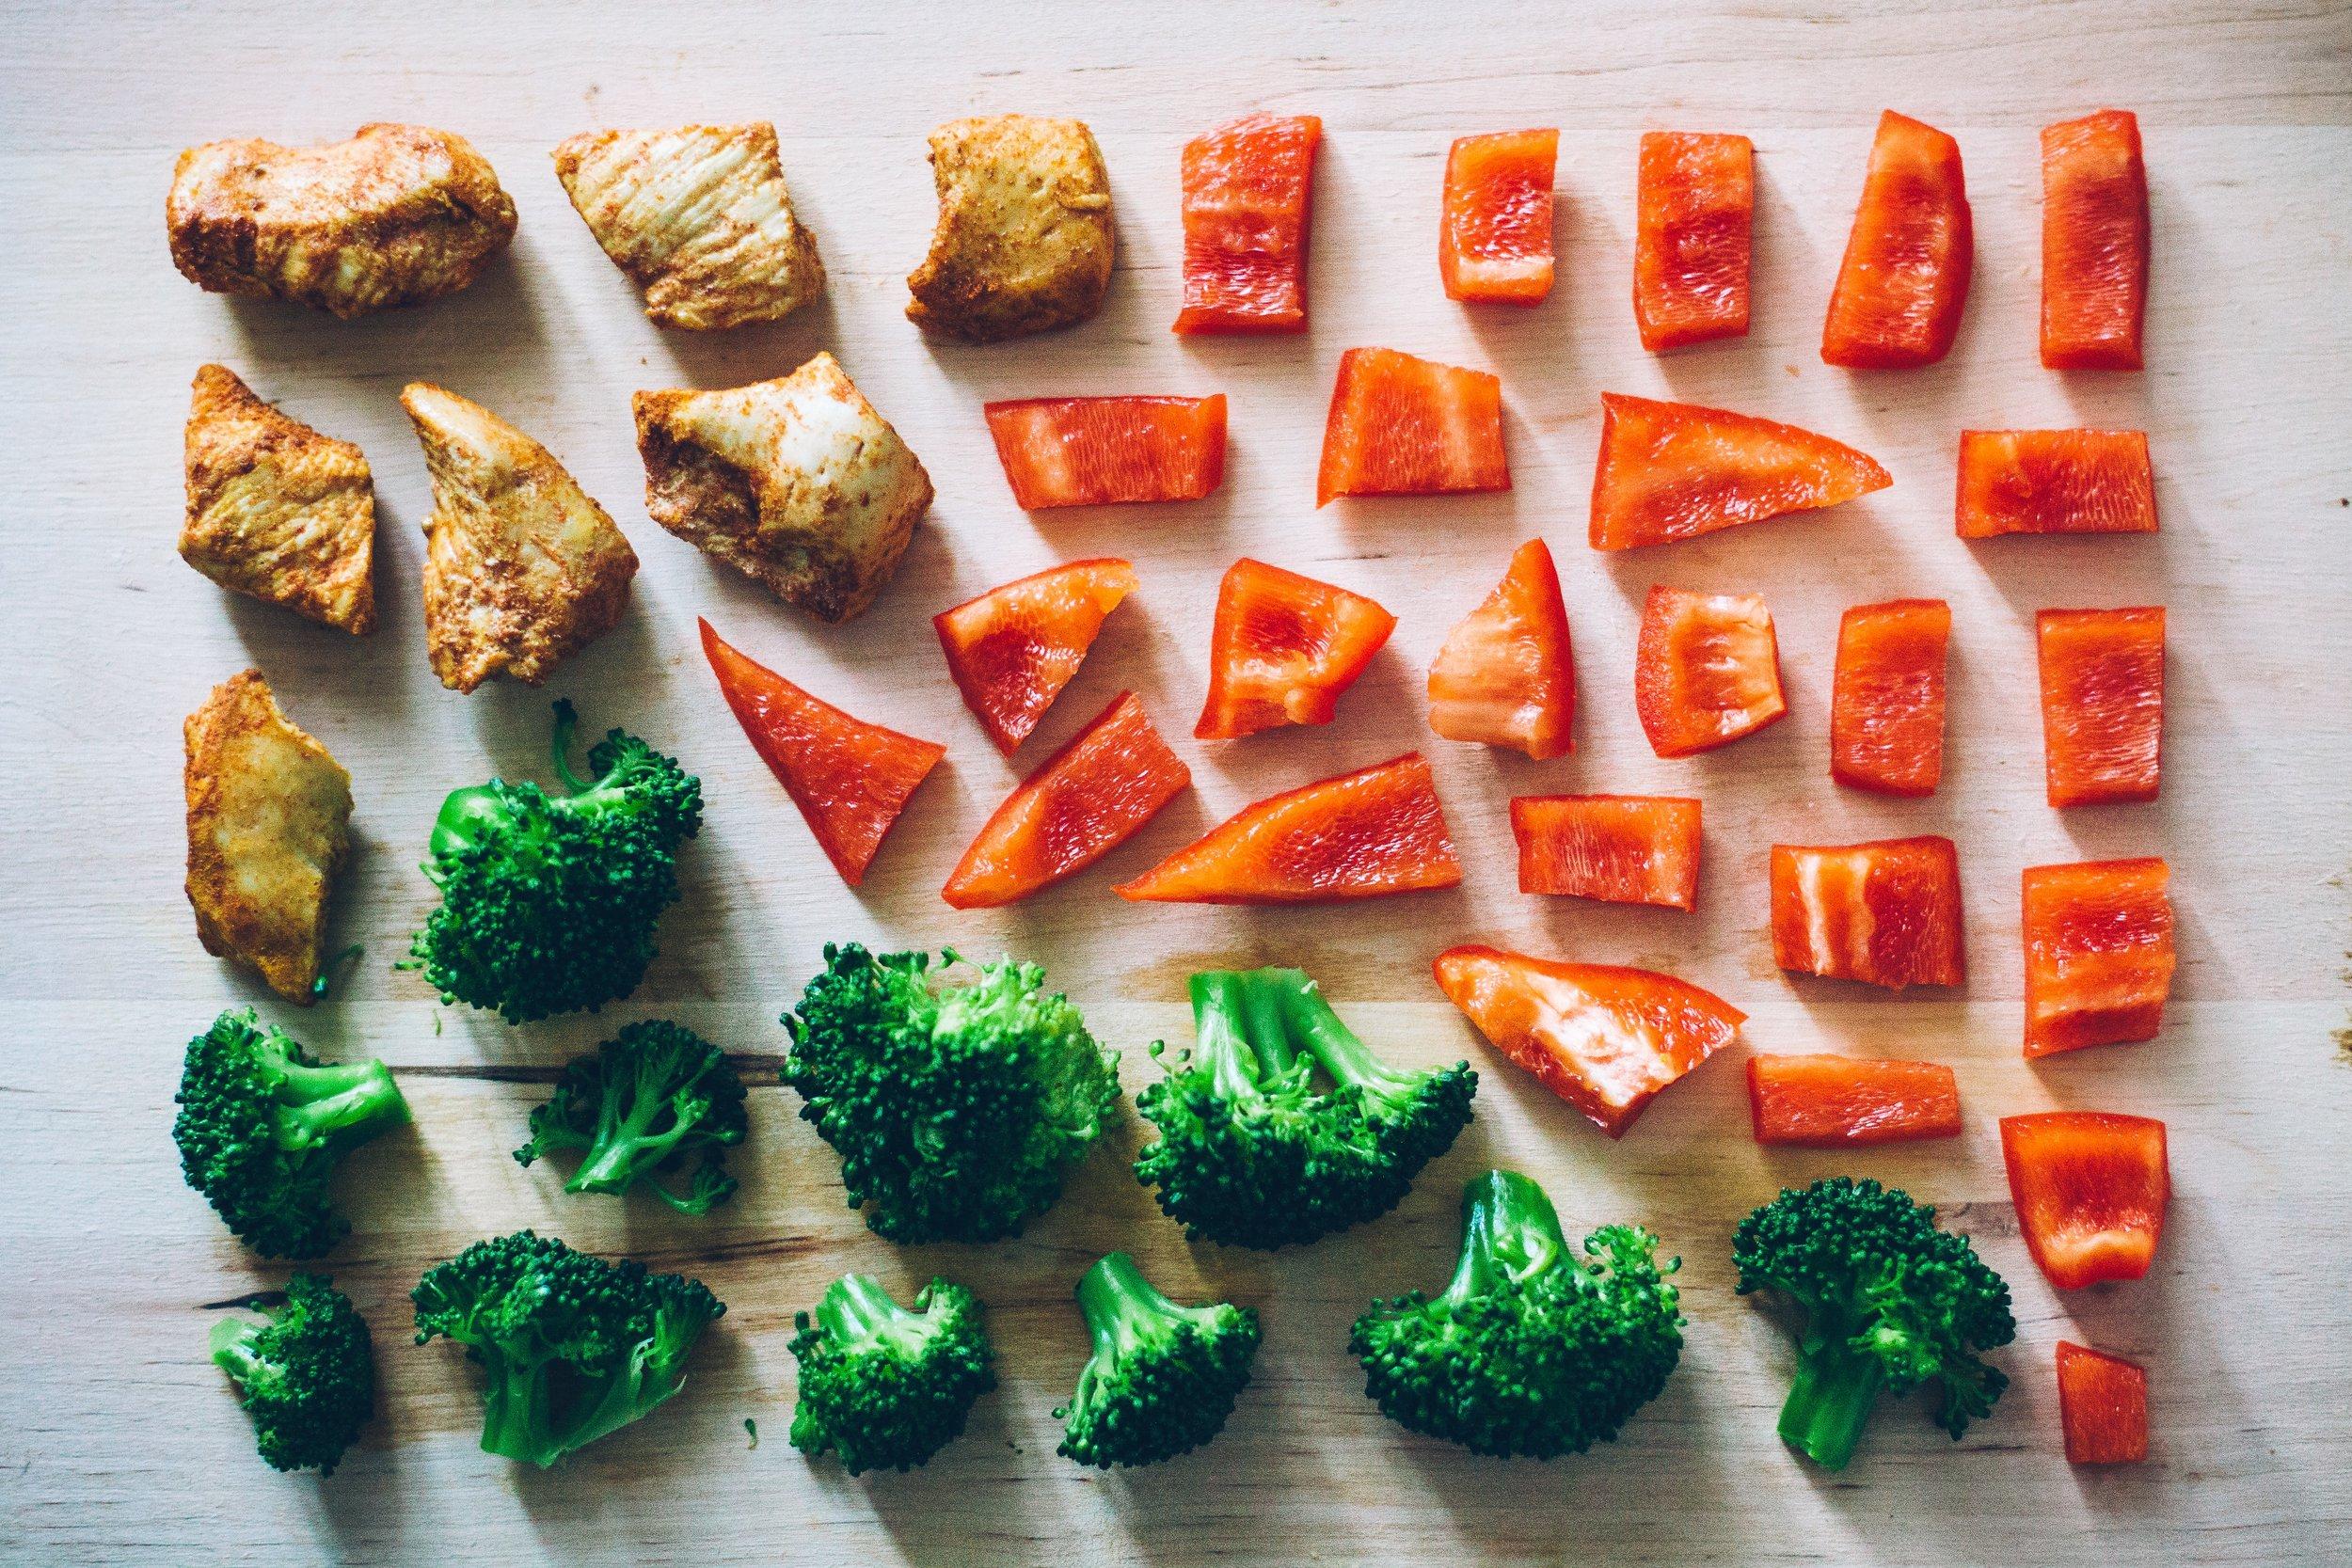 broccoli-cooking-dinner-8844.jpg